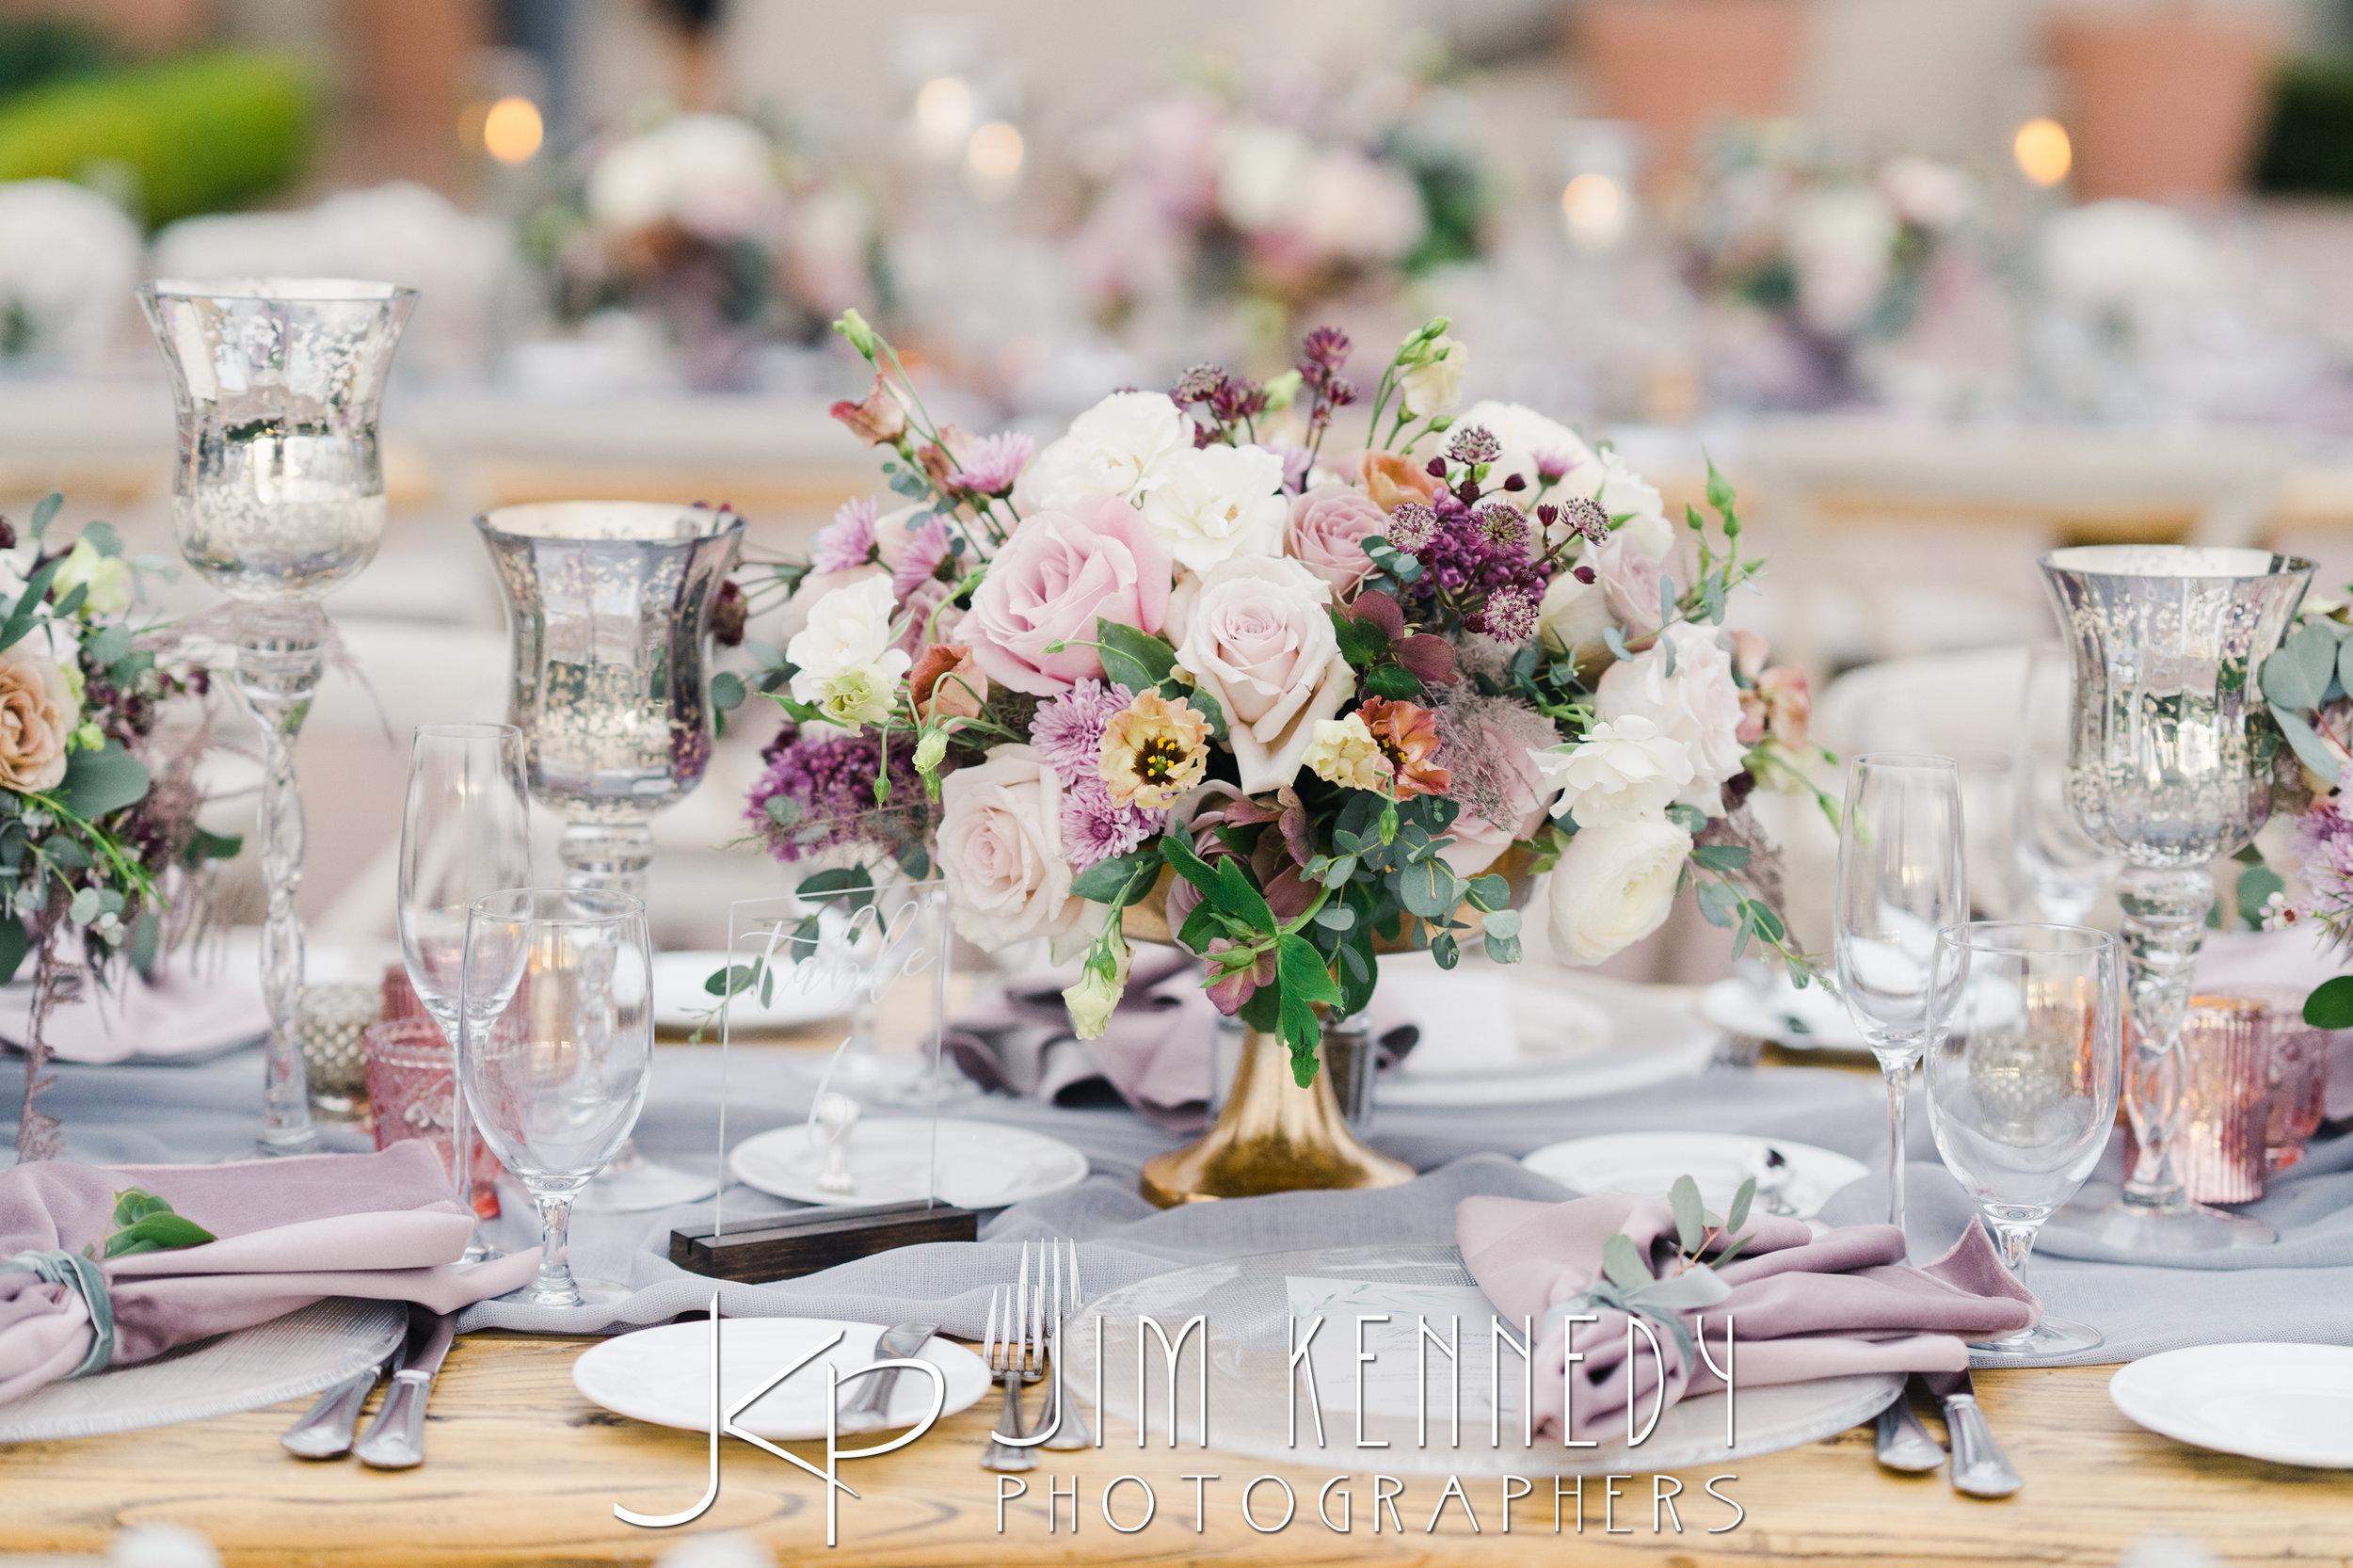 pelican-hill-wedding-jim-kenedy-photographers_0193.JPG